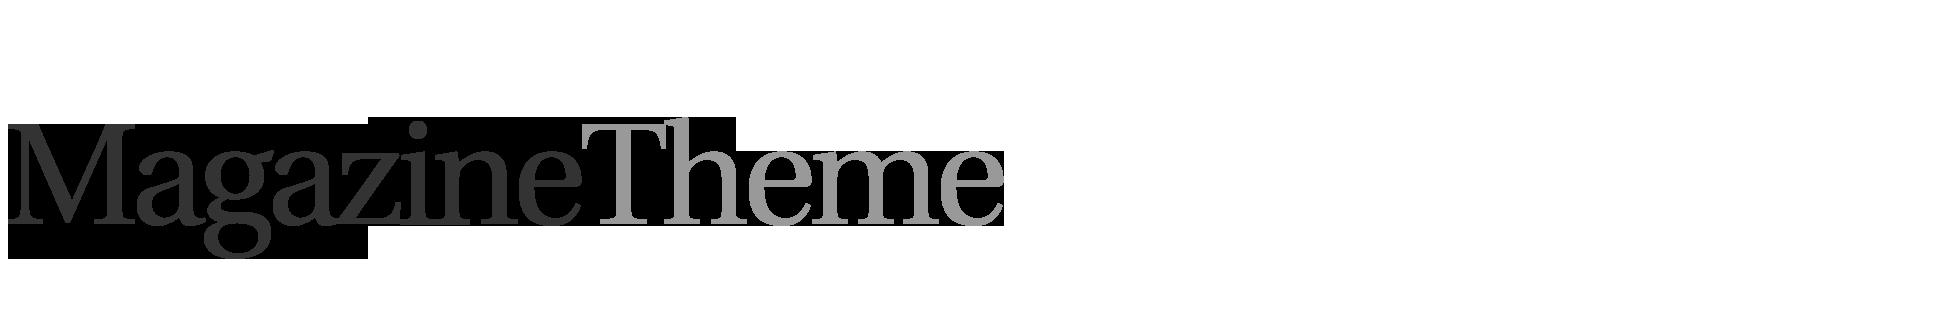 Magazine Theme